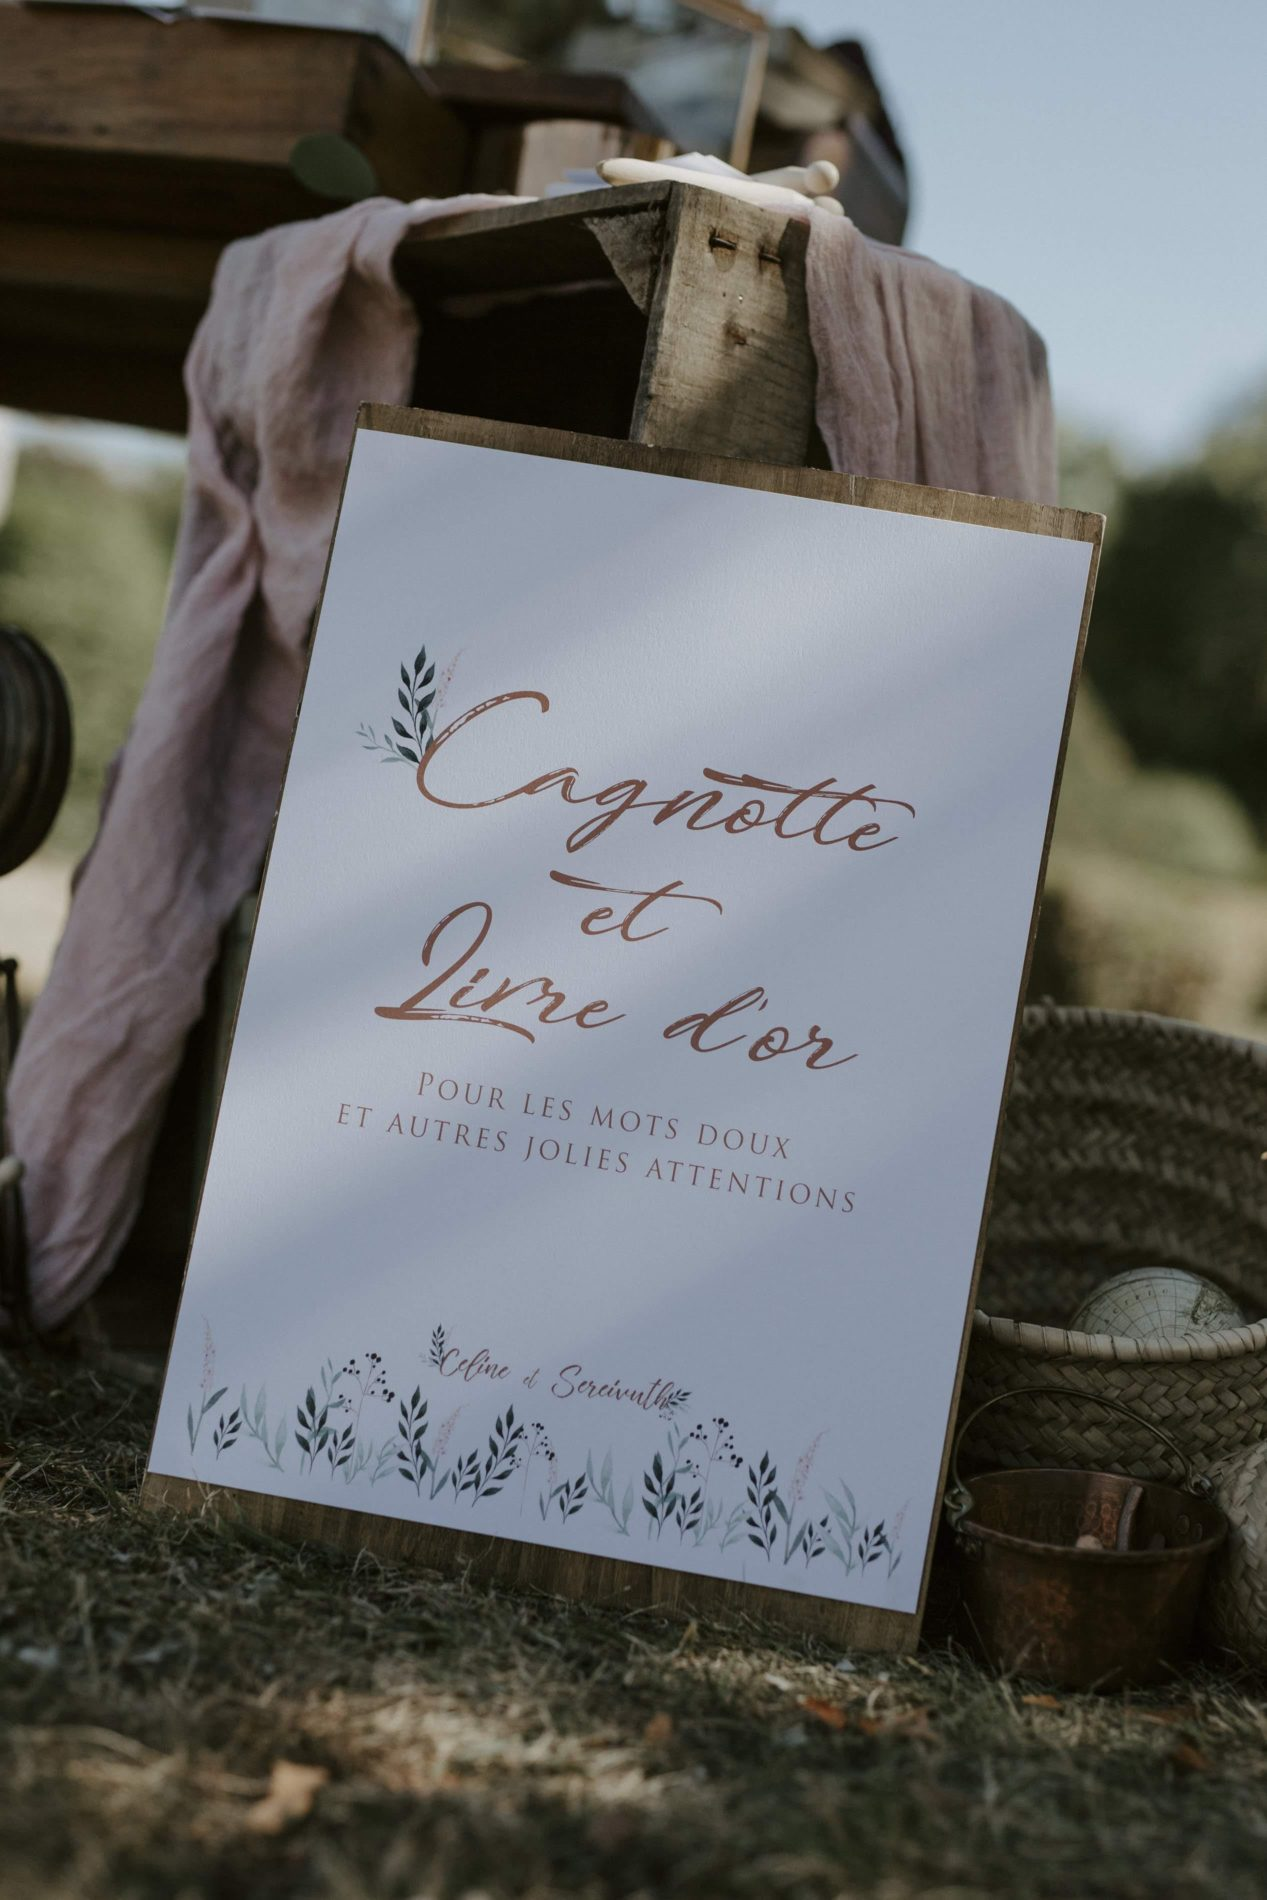 03-CelineSereivuth-7-obonheurdesdames-decoration-mariage-location-Jordane-Chaillou